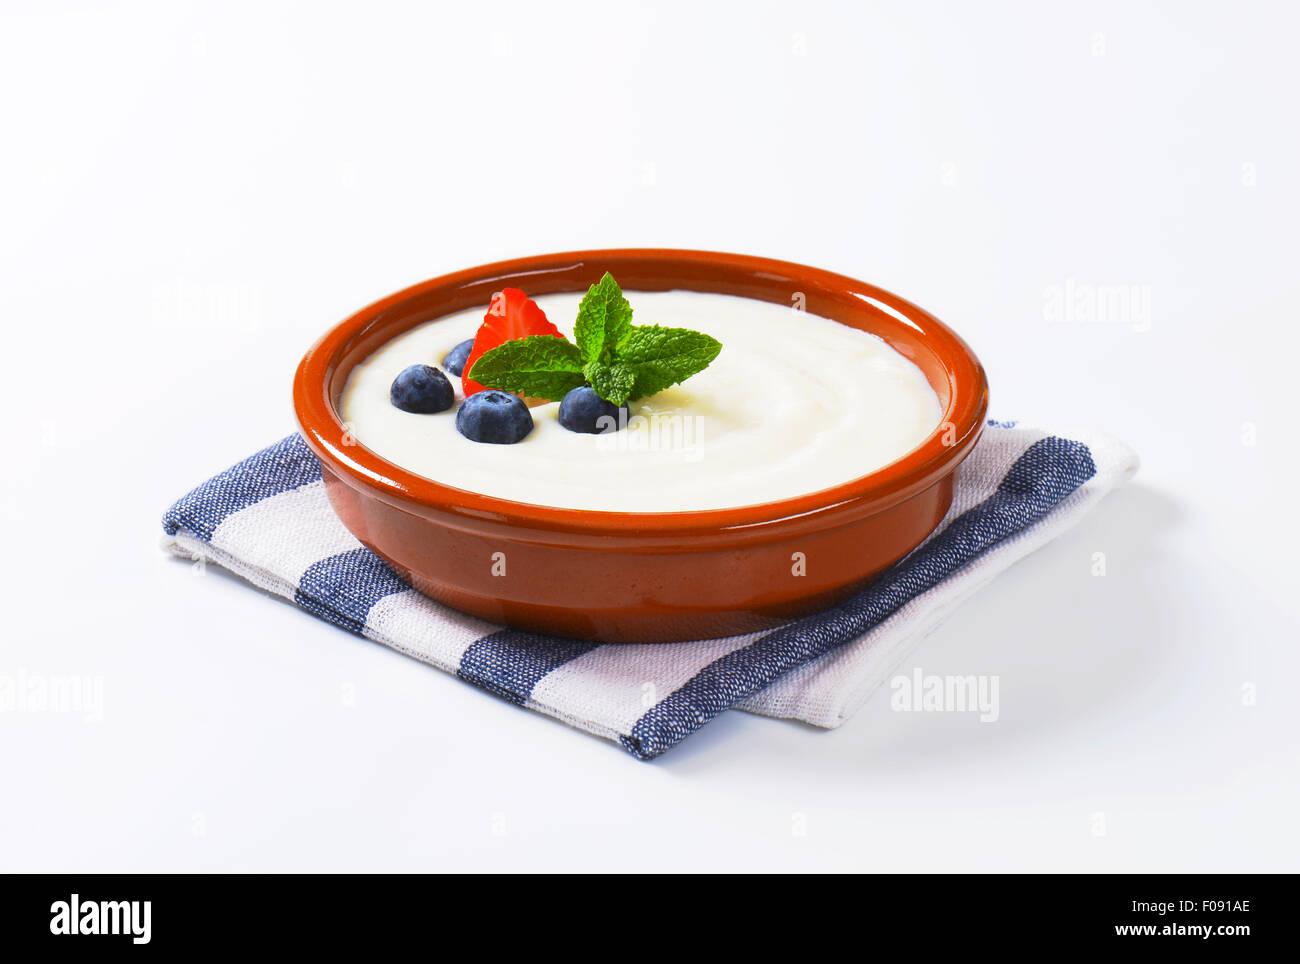 Smooth semolina porridge served in terracotta dish with fresh fruit - Stock Image